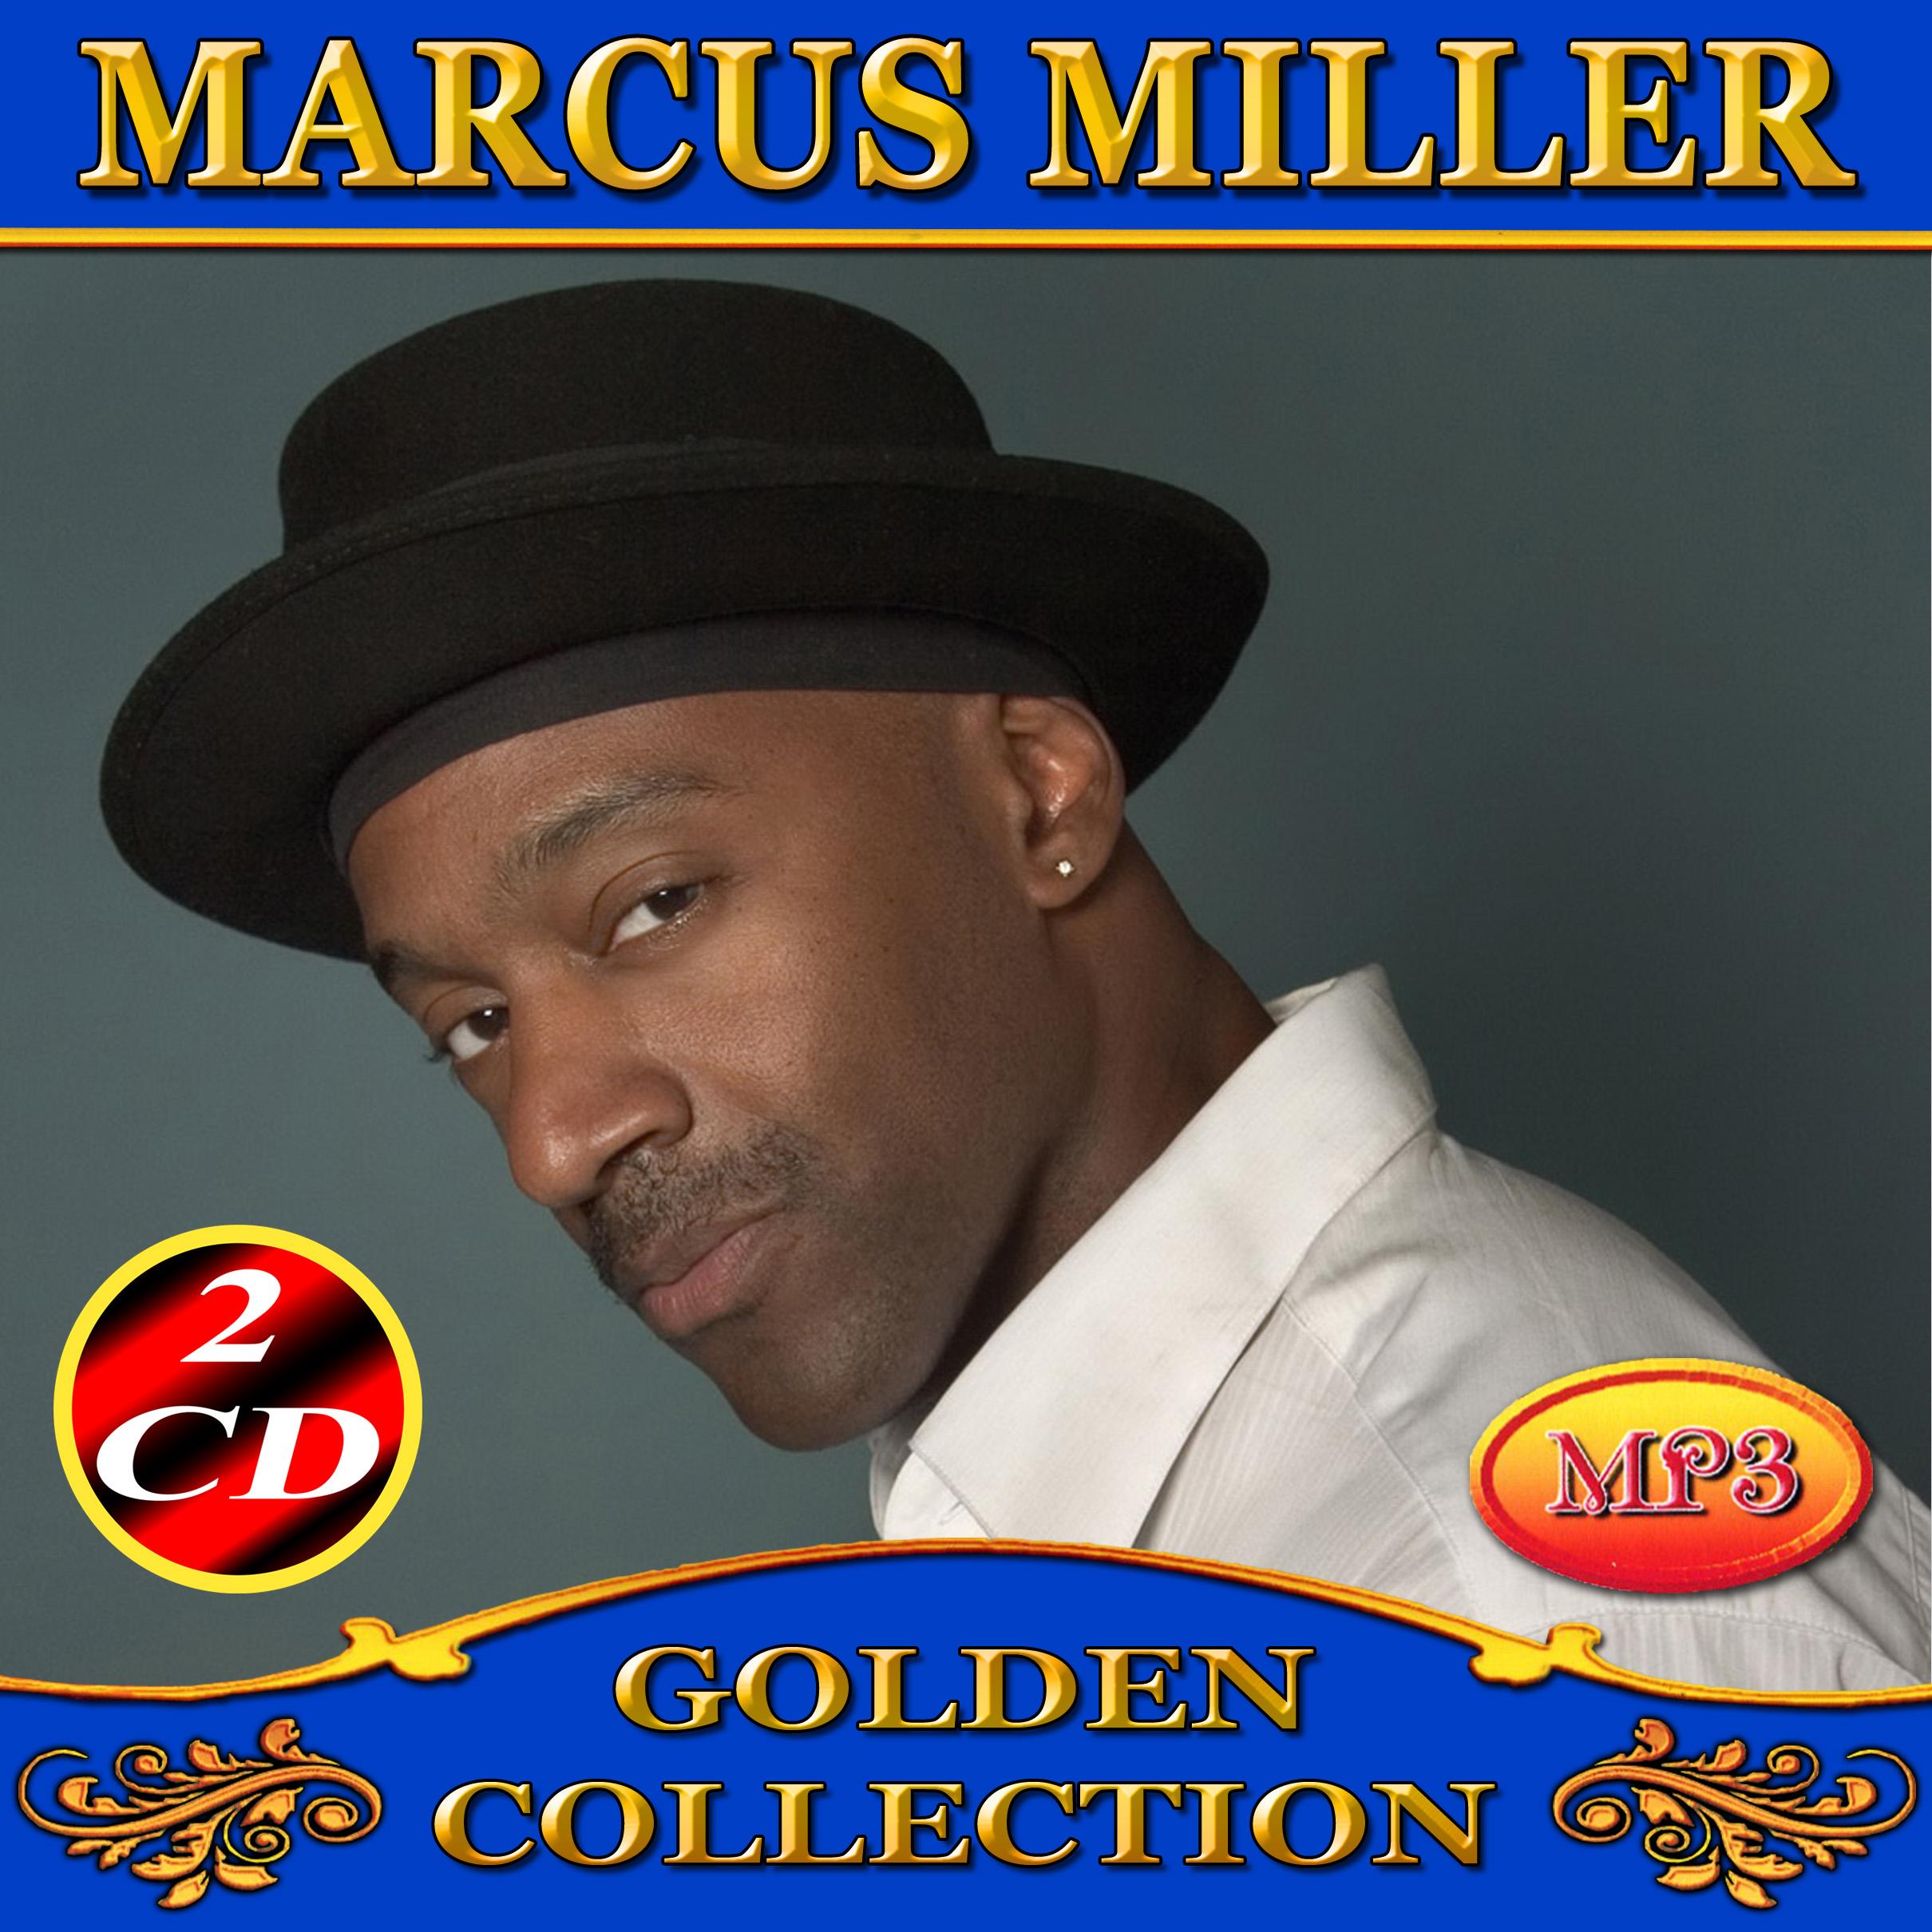 Marcus Miller 2cd [mp3]